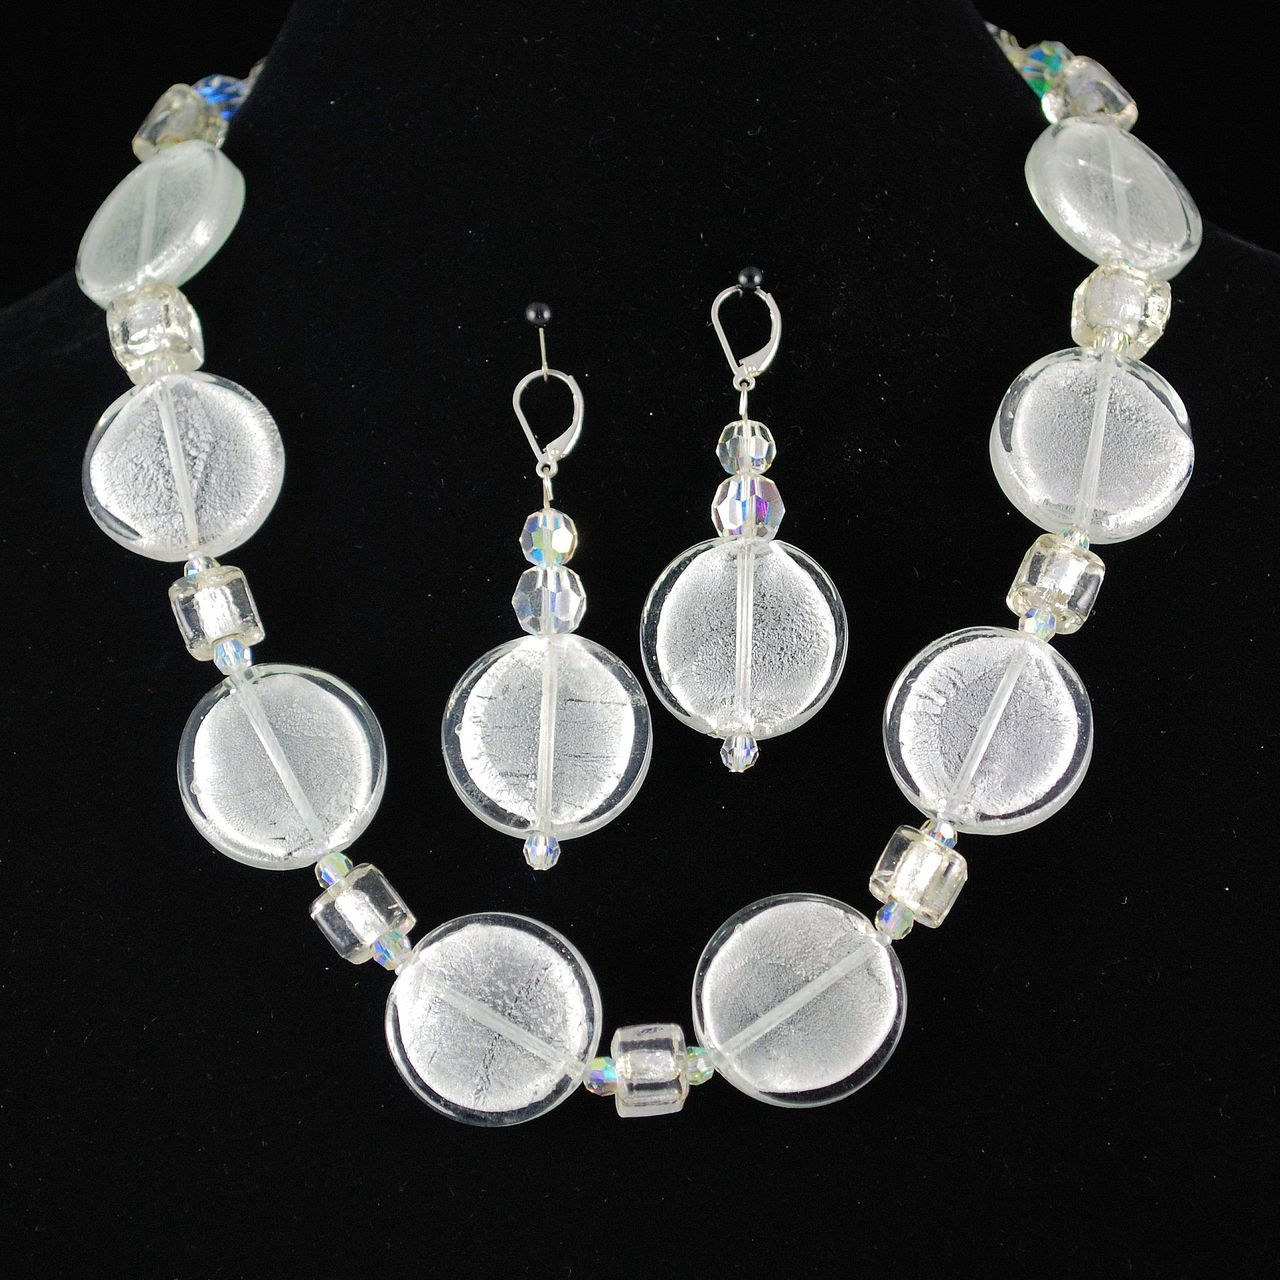 Enchanting Jewelry Creations image 67